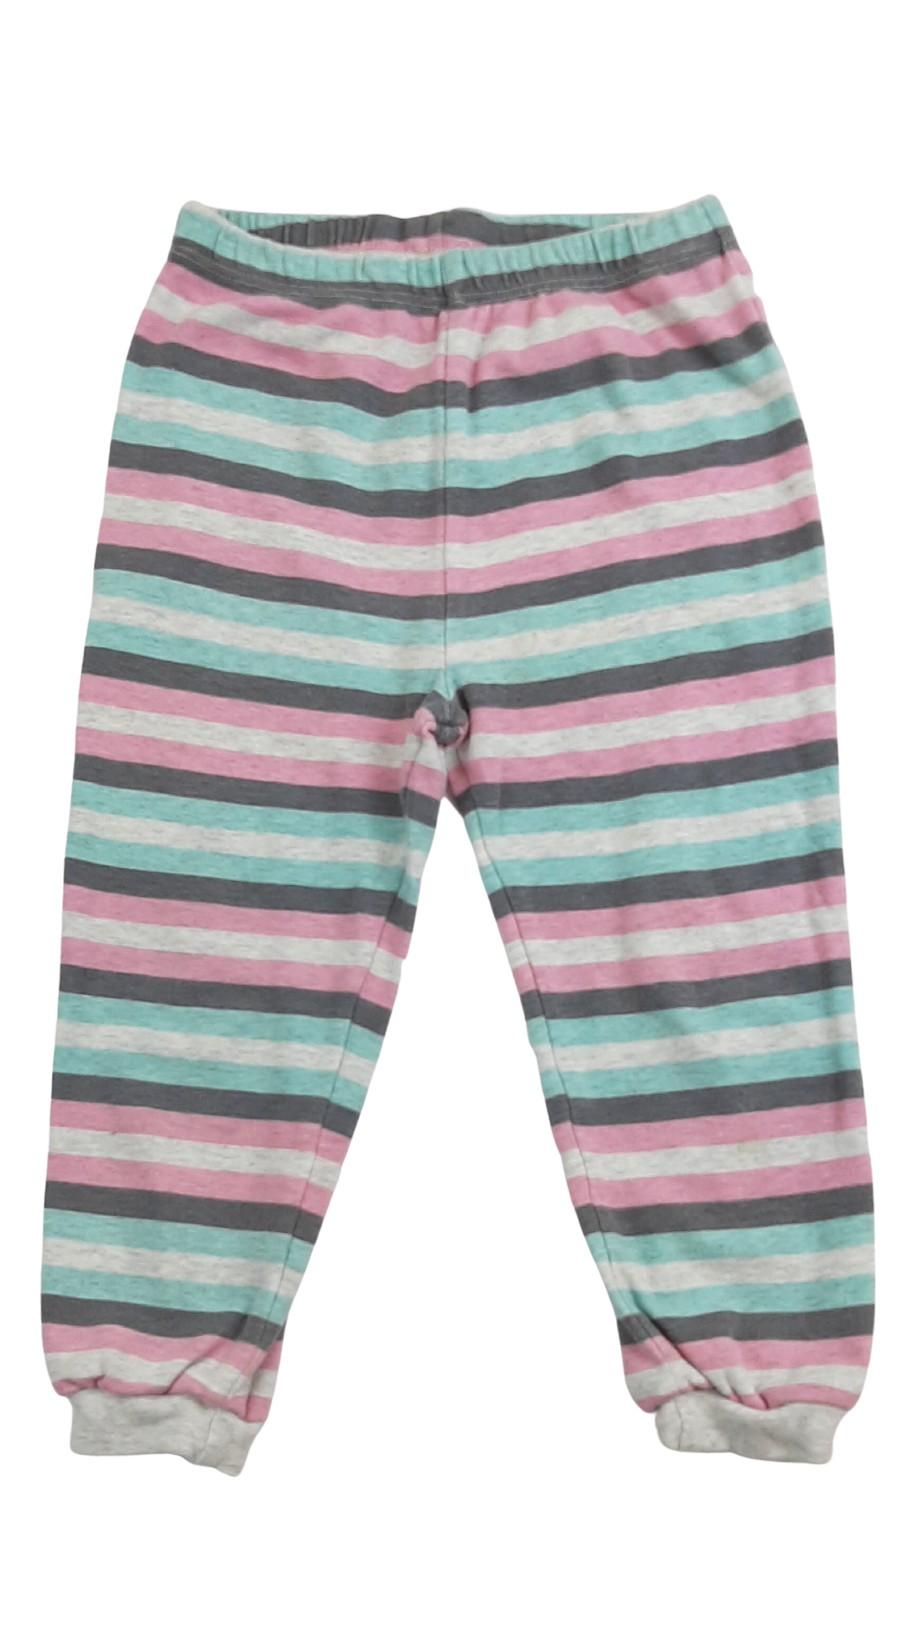 Pantalon en coton ouaté